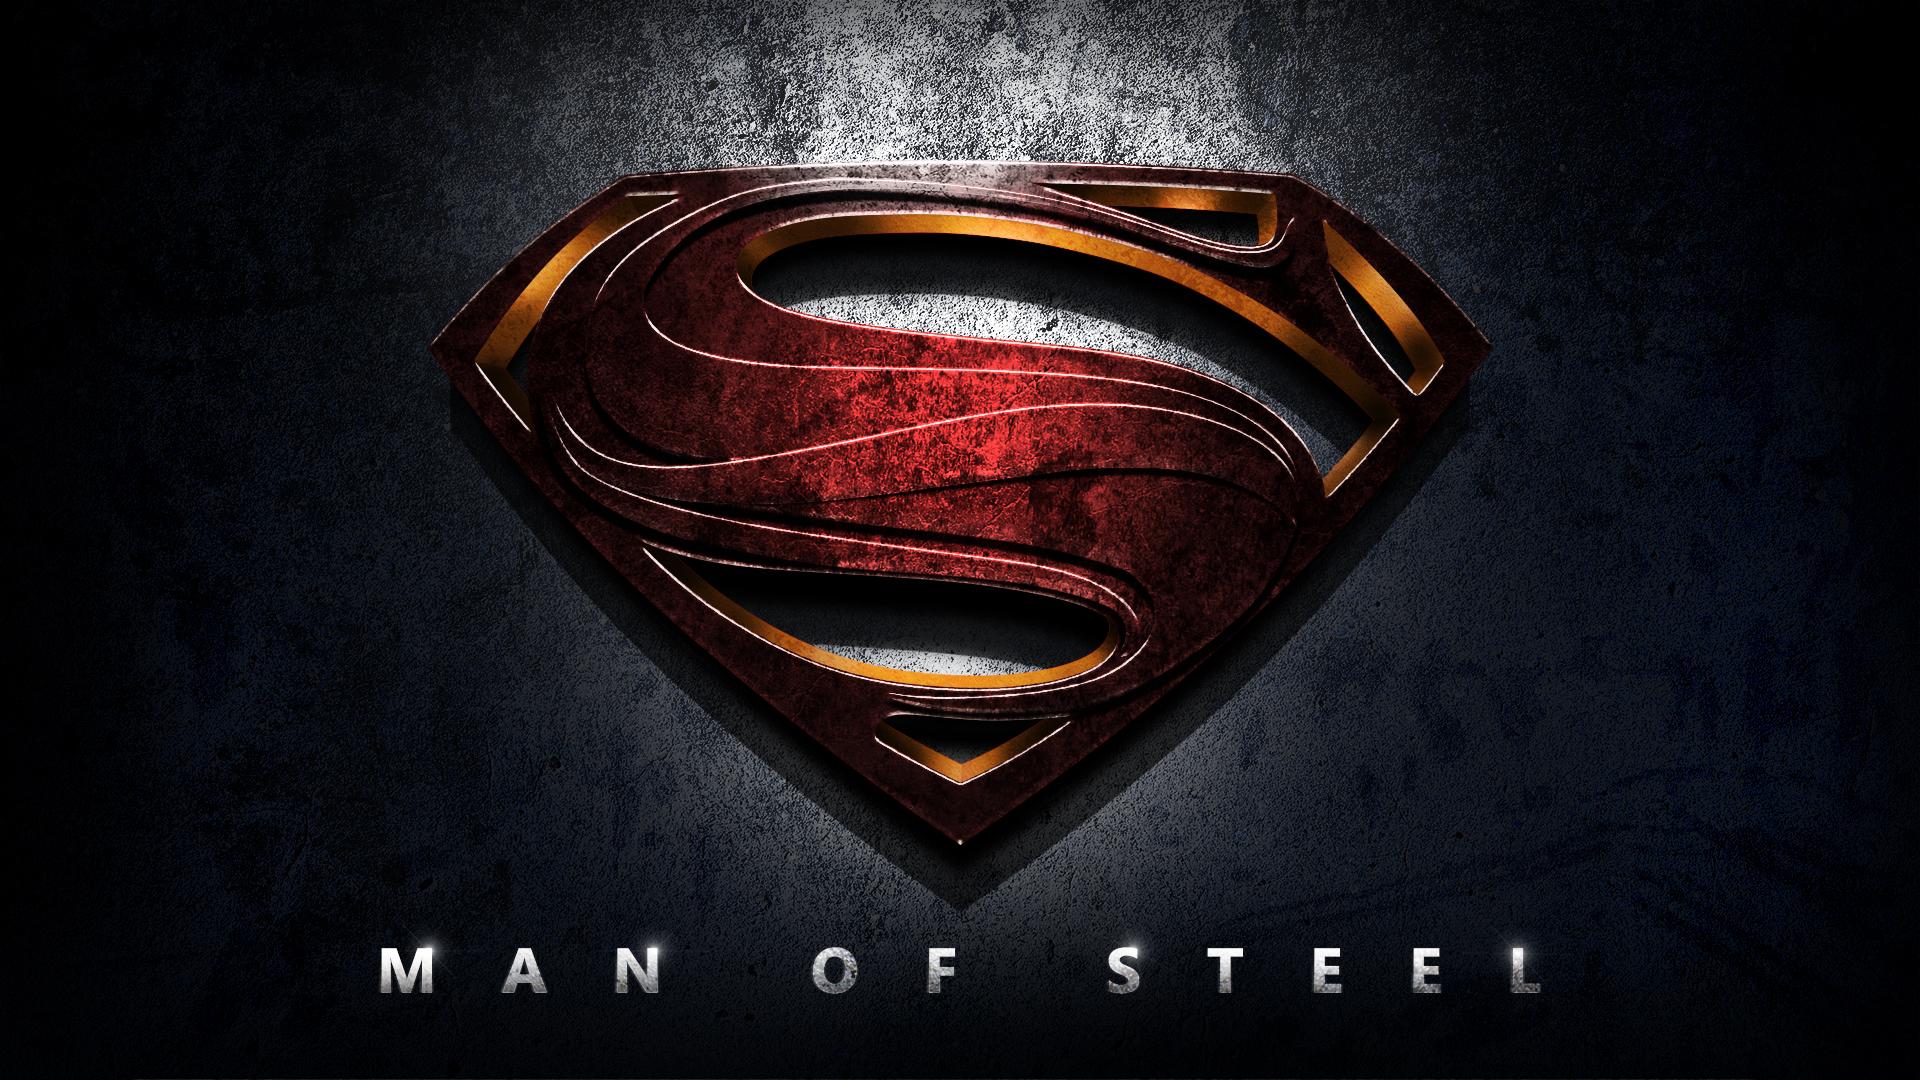 48 Man Of Steel Wallpaper Hd On Wallpapersafari